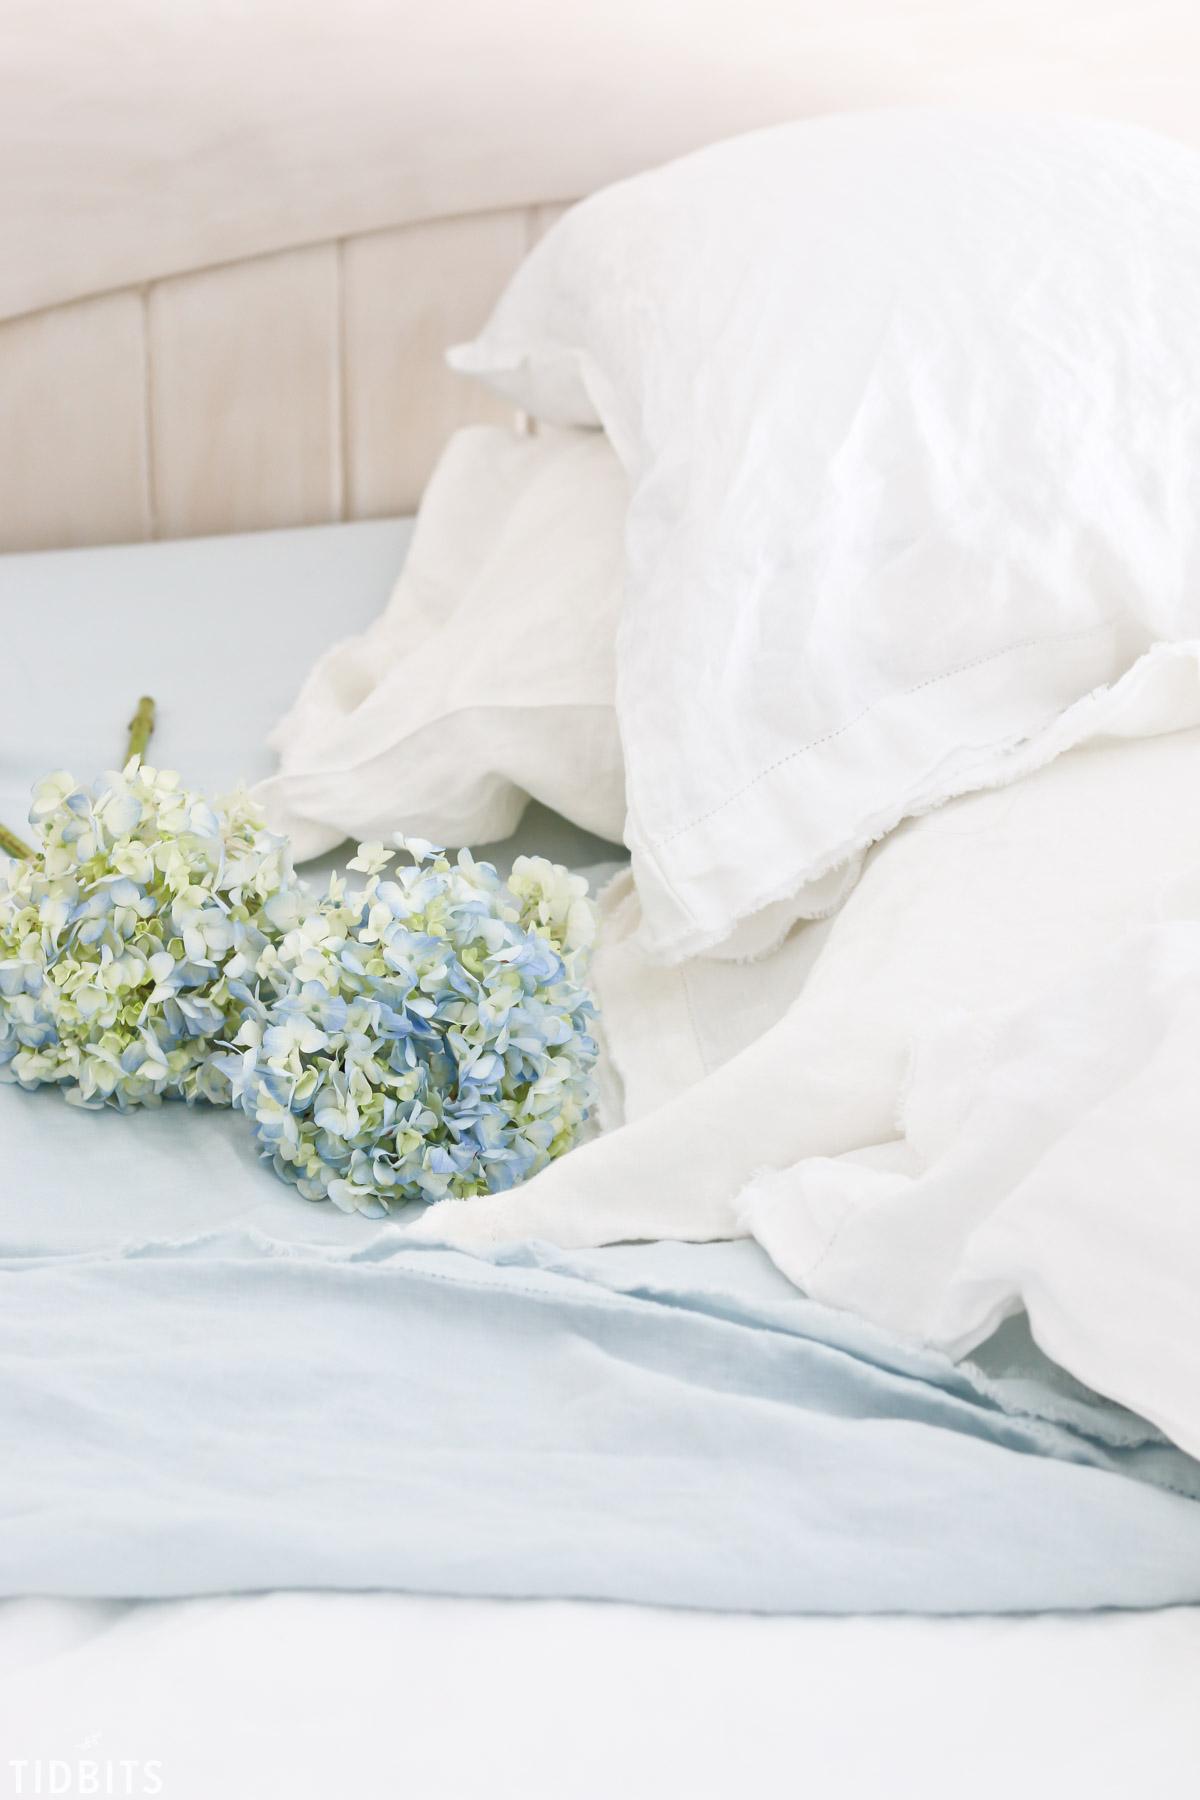 soft blue hydrangeas and linen sheets